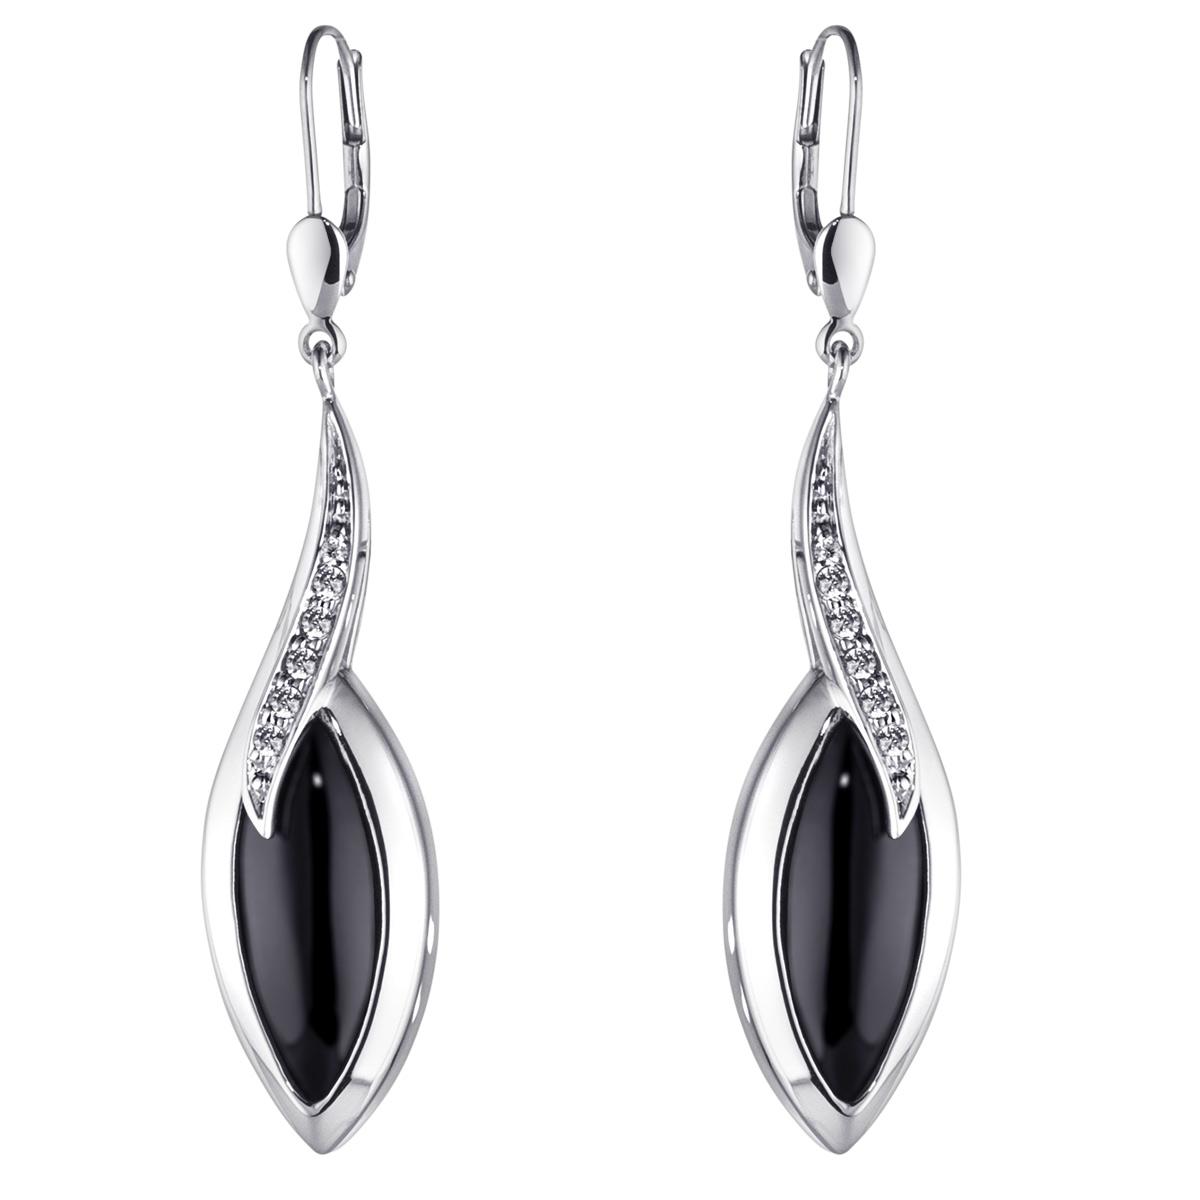 Onyx Ohrhänger Damen 925 Silber Tropfen Ohrringe schwarz lang